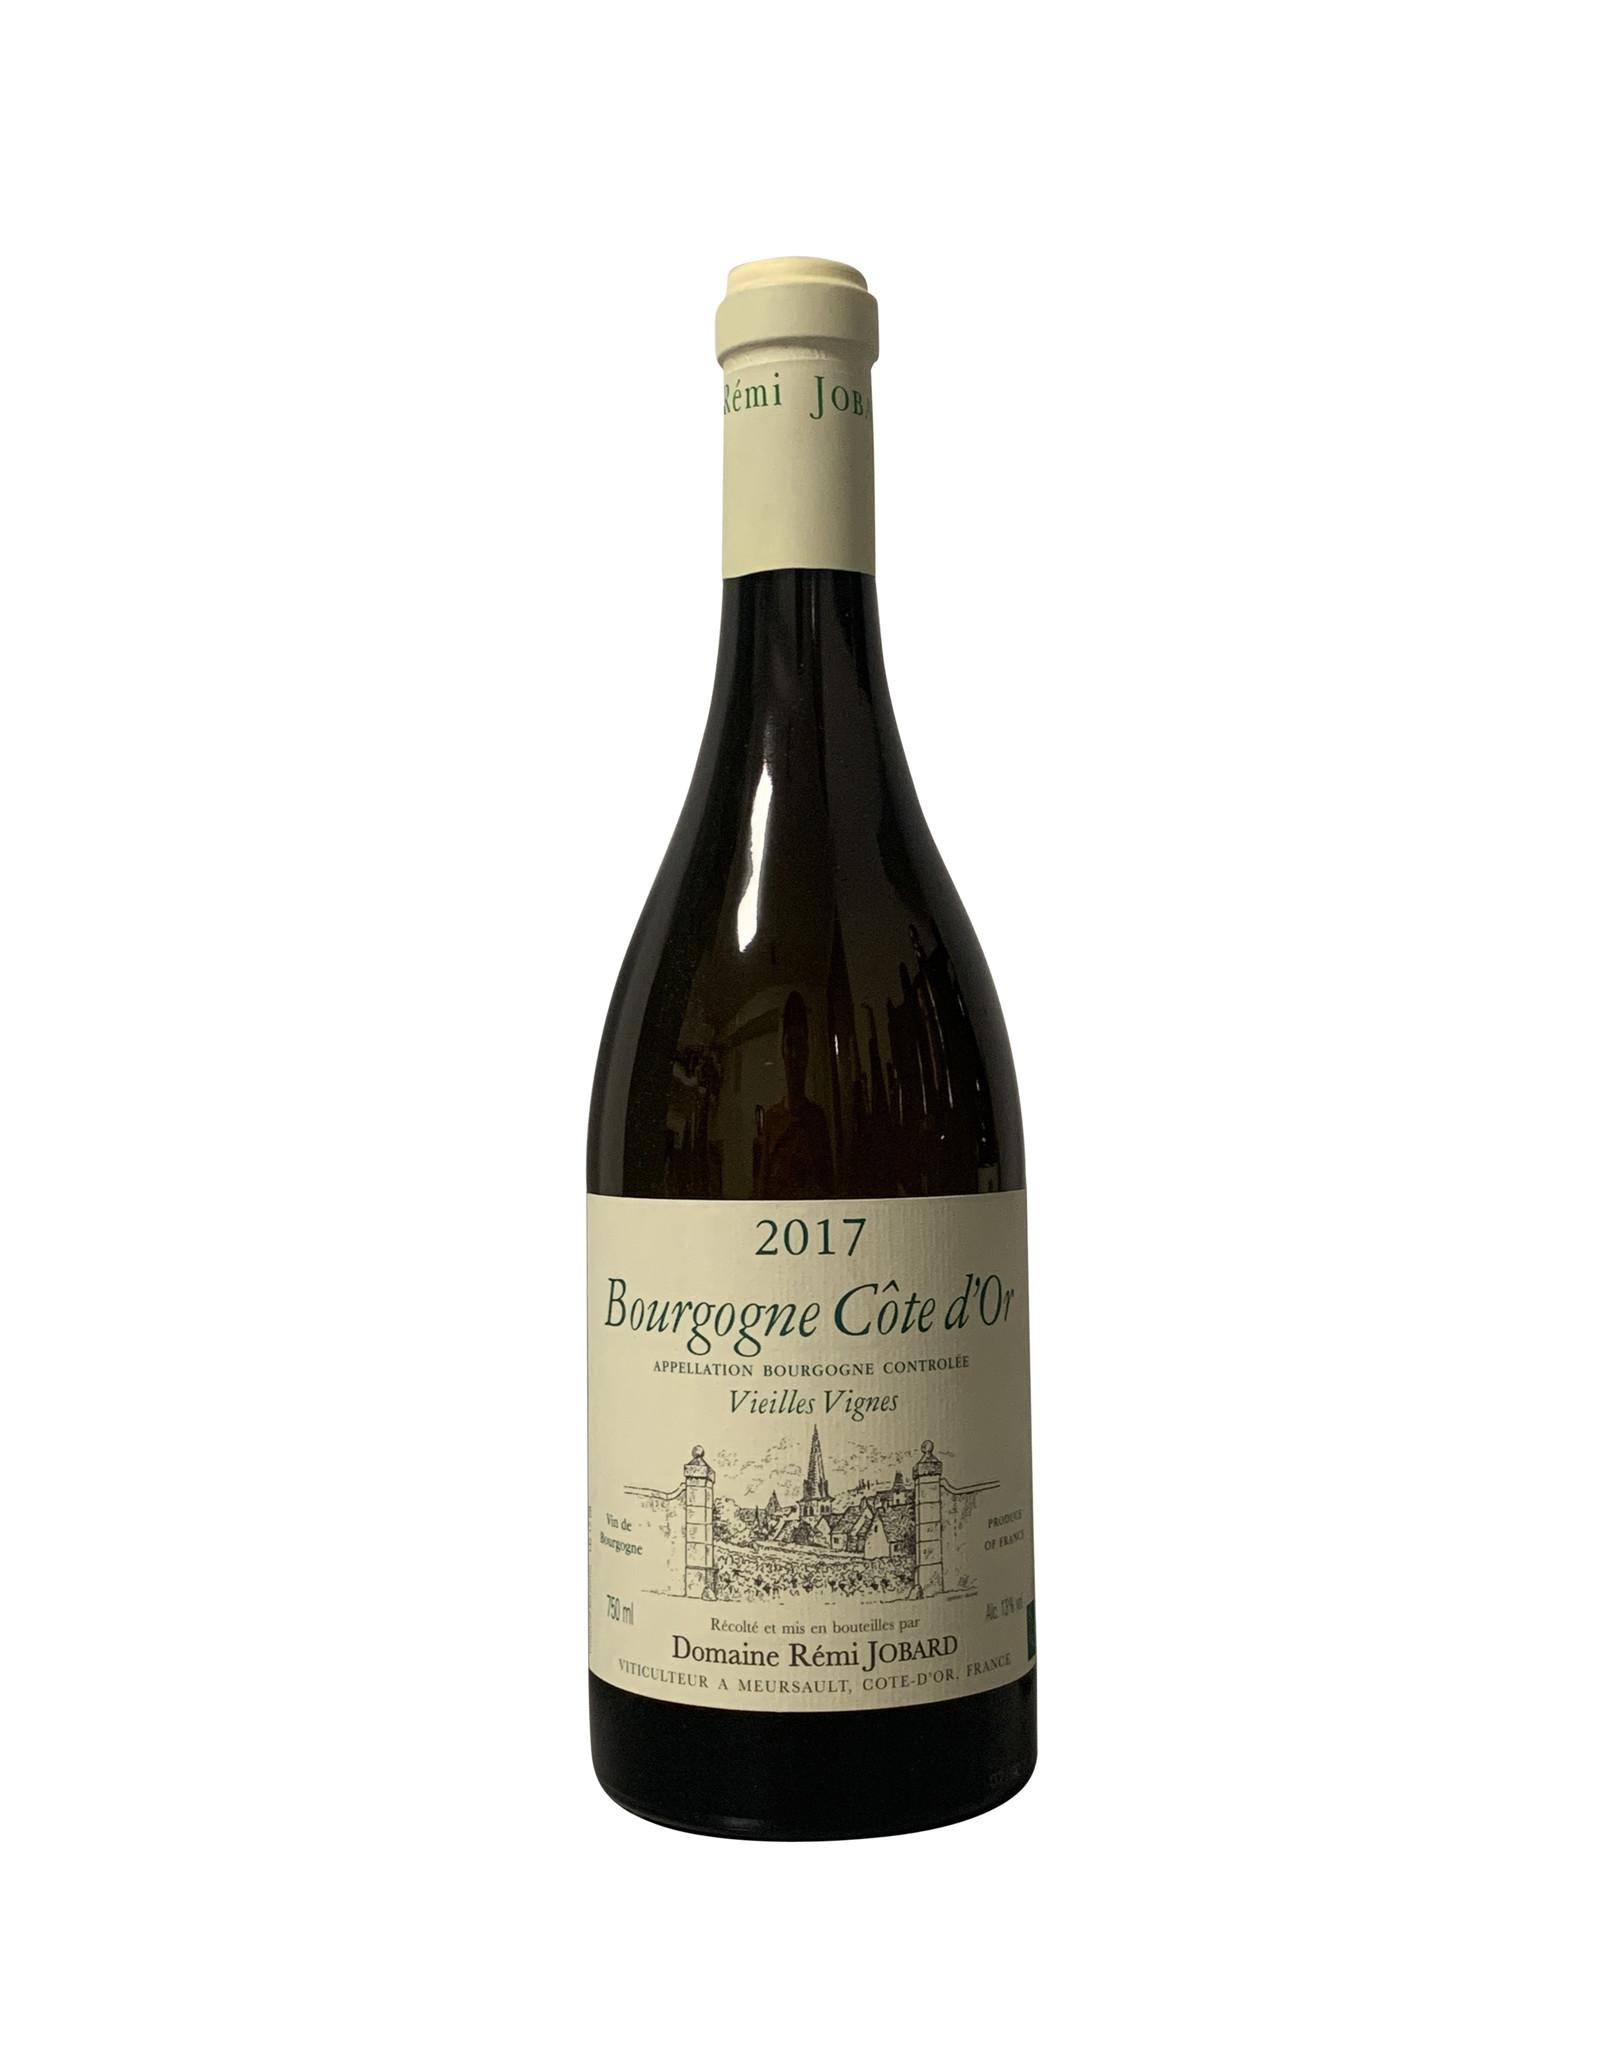 Remi Jobard Rémi Jobard, Domaine Bourgogne Blanc Vieilles Vignes 2017, Burgundy, France (750mL)